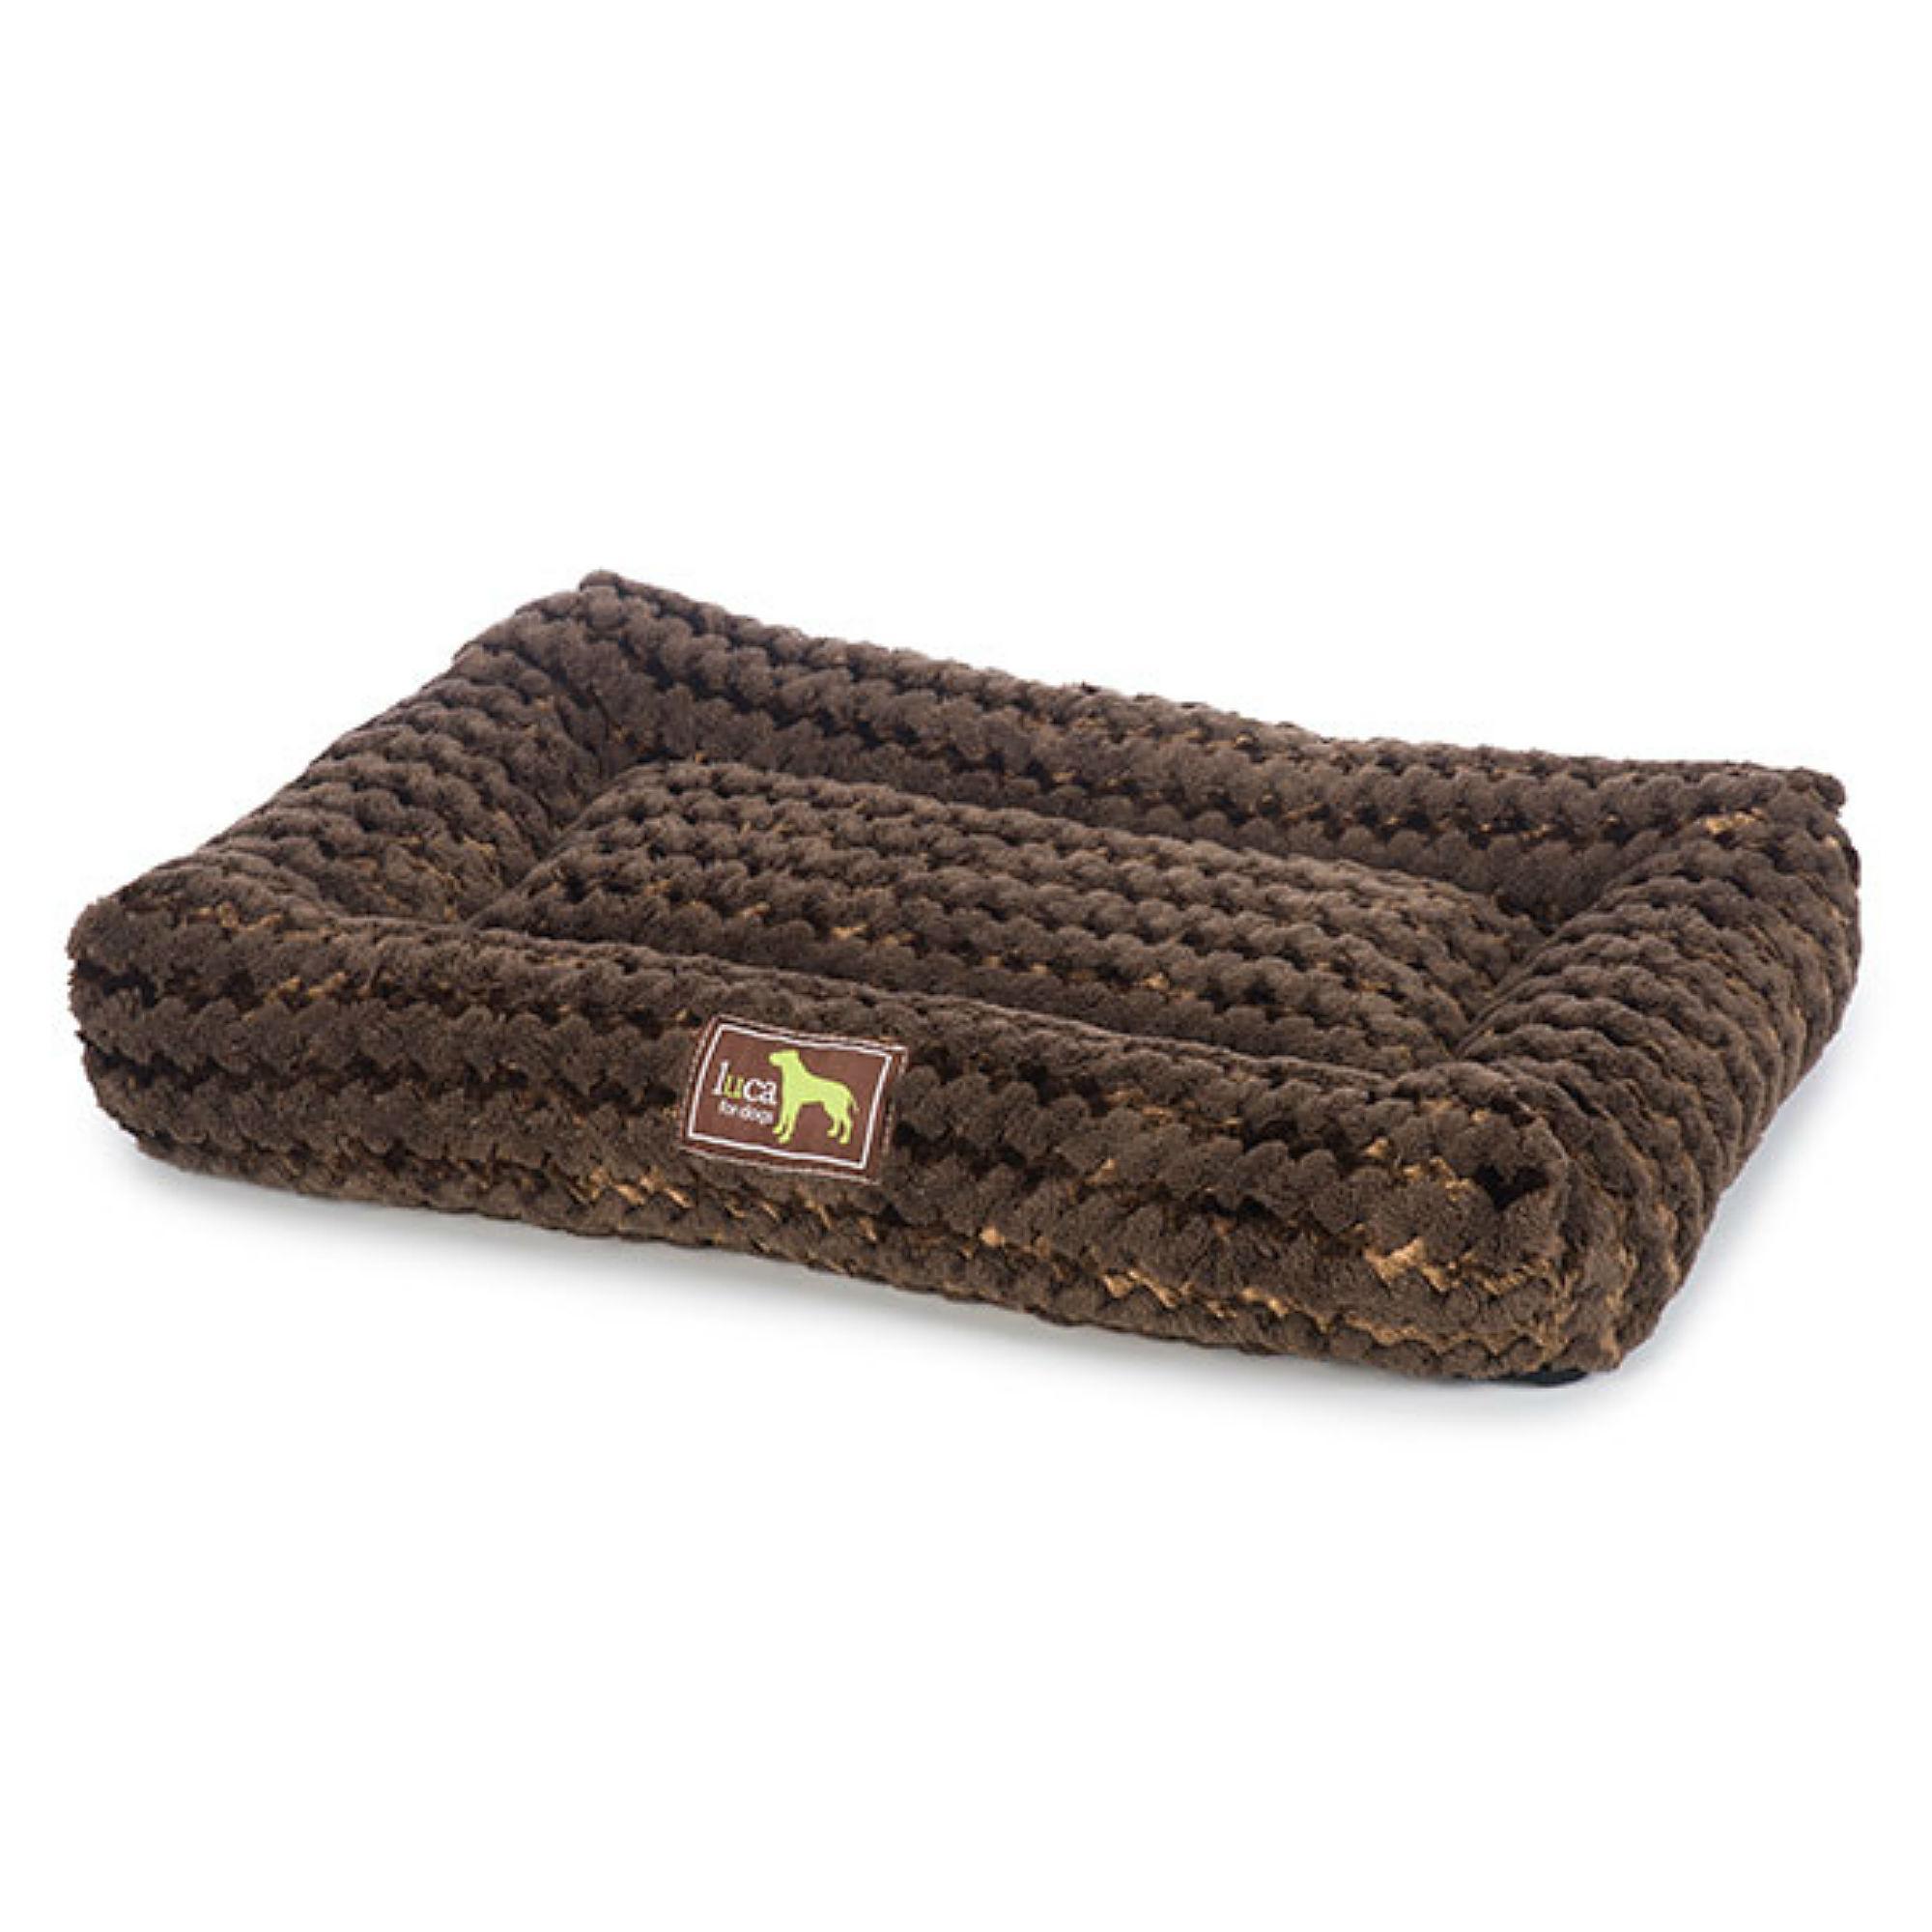 Luca Crate Cuddler Plush Dog Bed - Chocolate Swirl